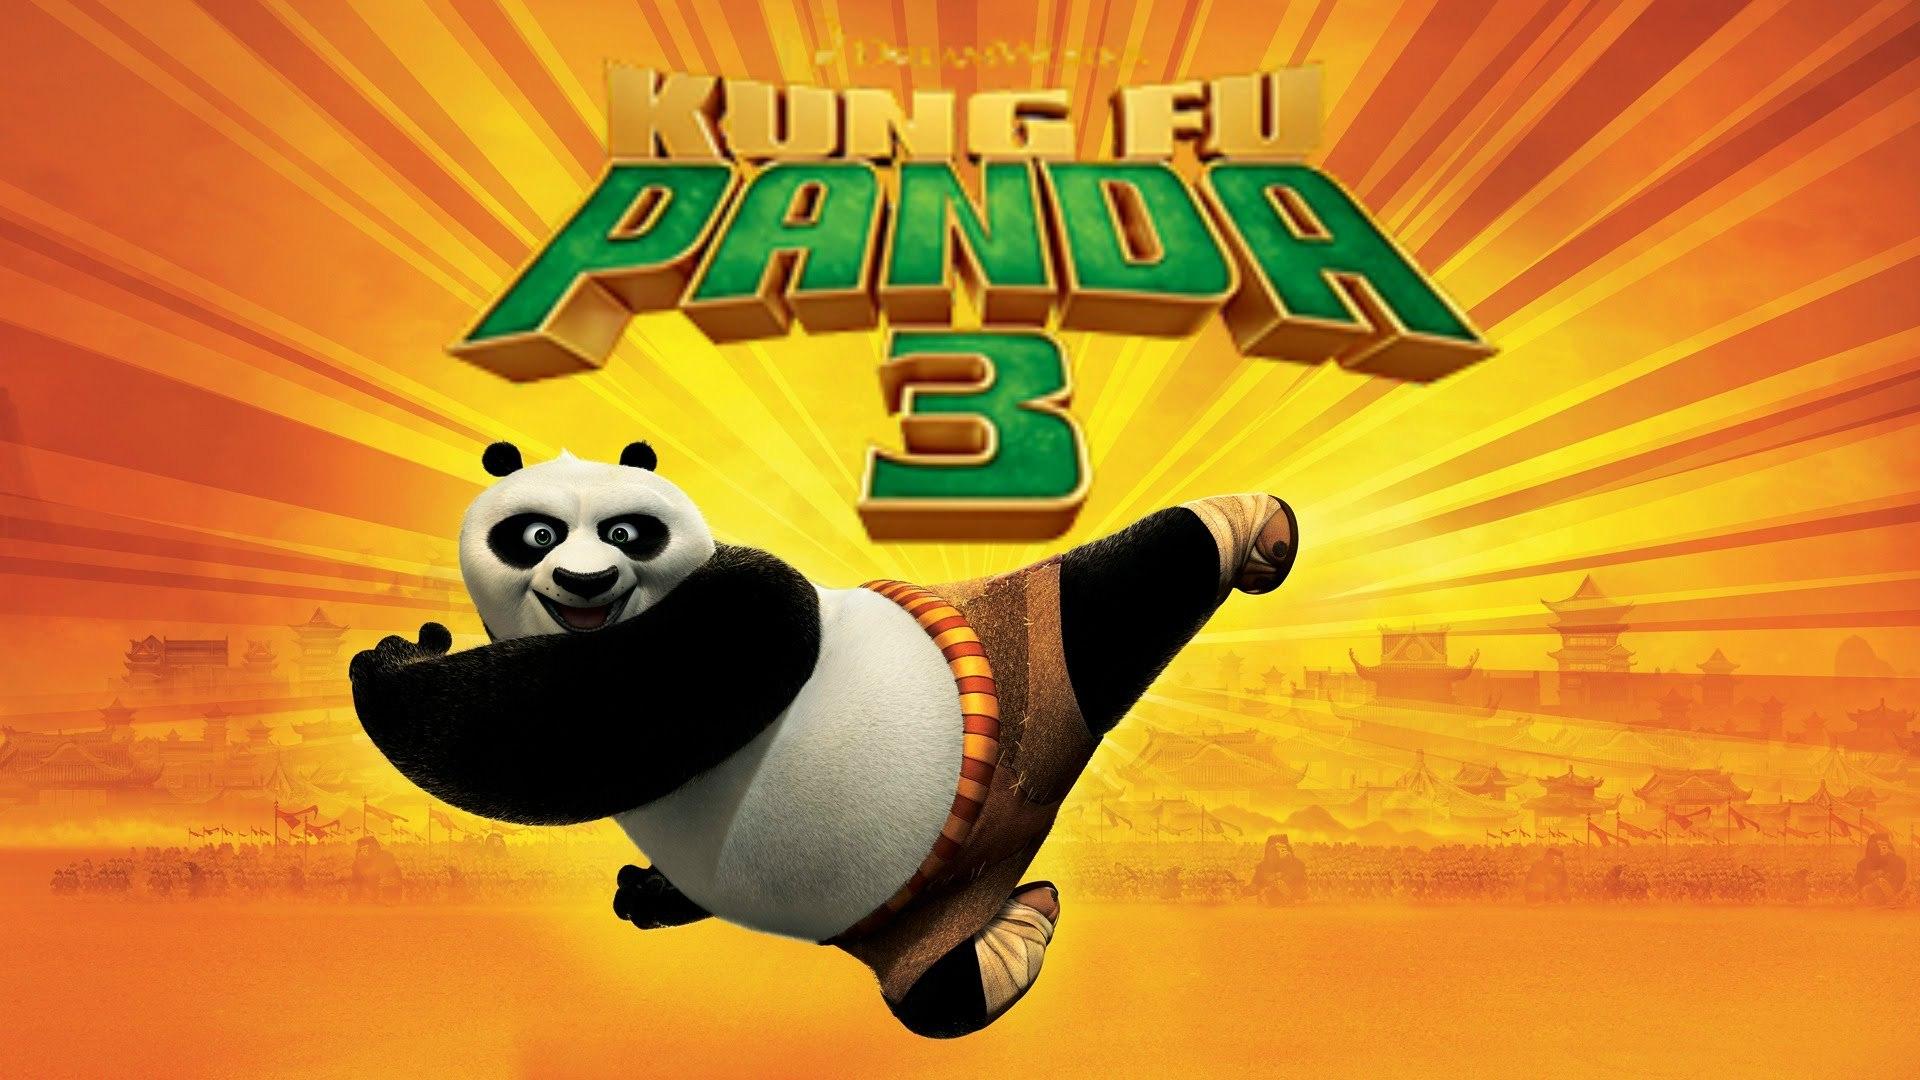 Watch Kung Fu Panda 3 Full Movie